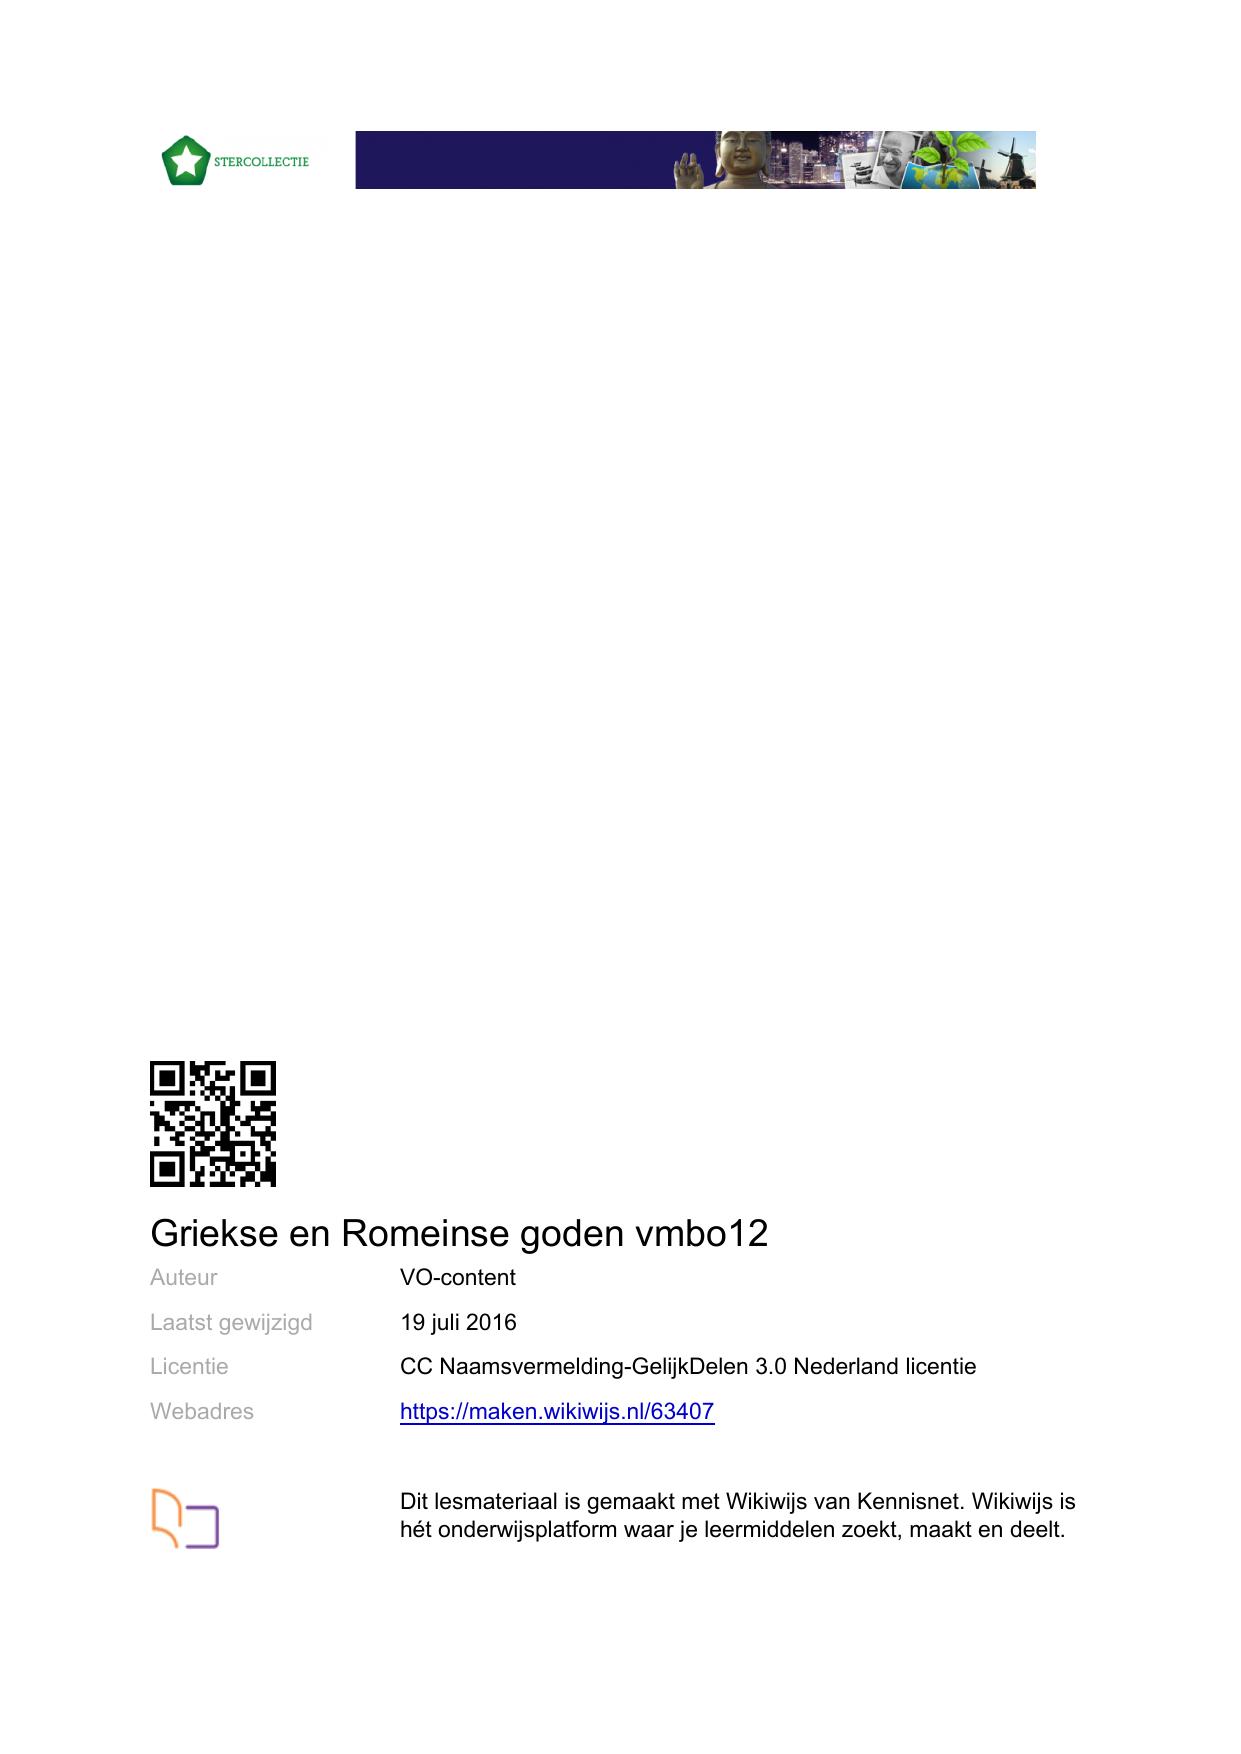 Wonderbaarlijk Griekse en Romeinse goden vmbo12   PDF-versie BU-98